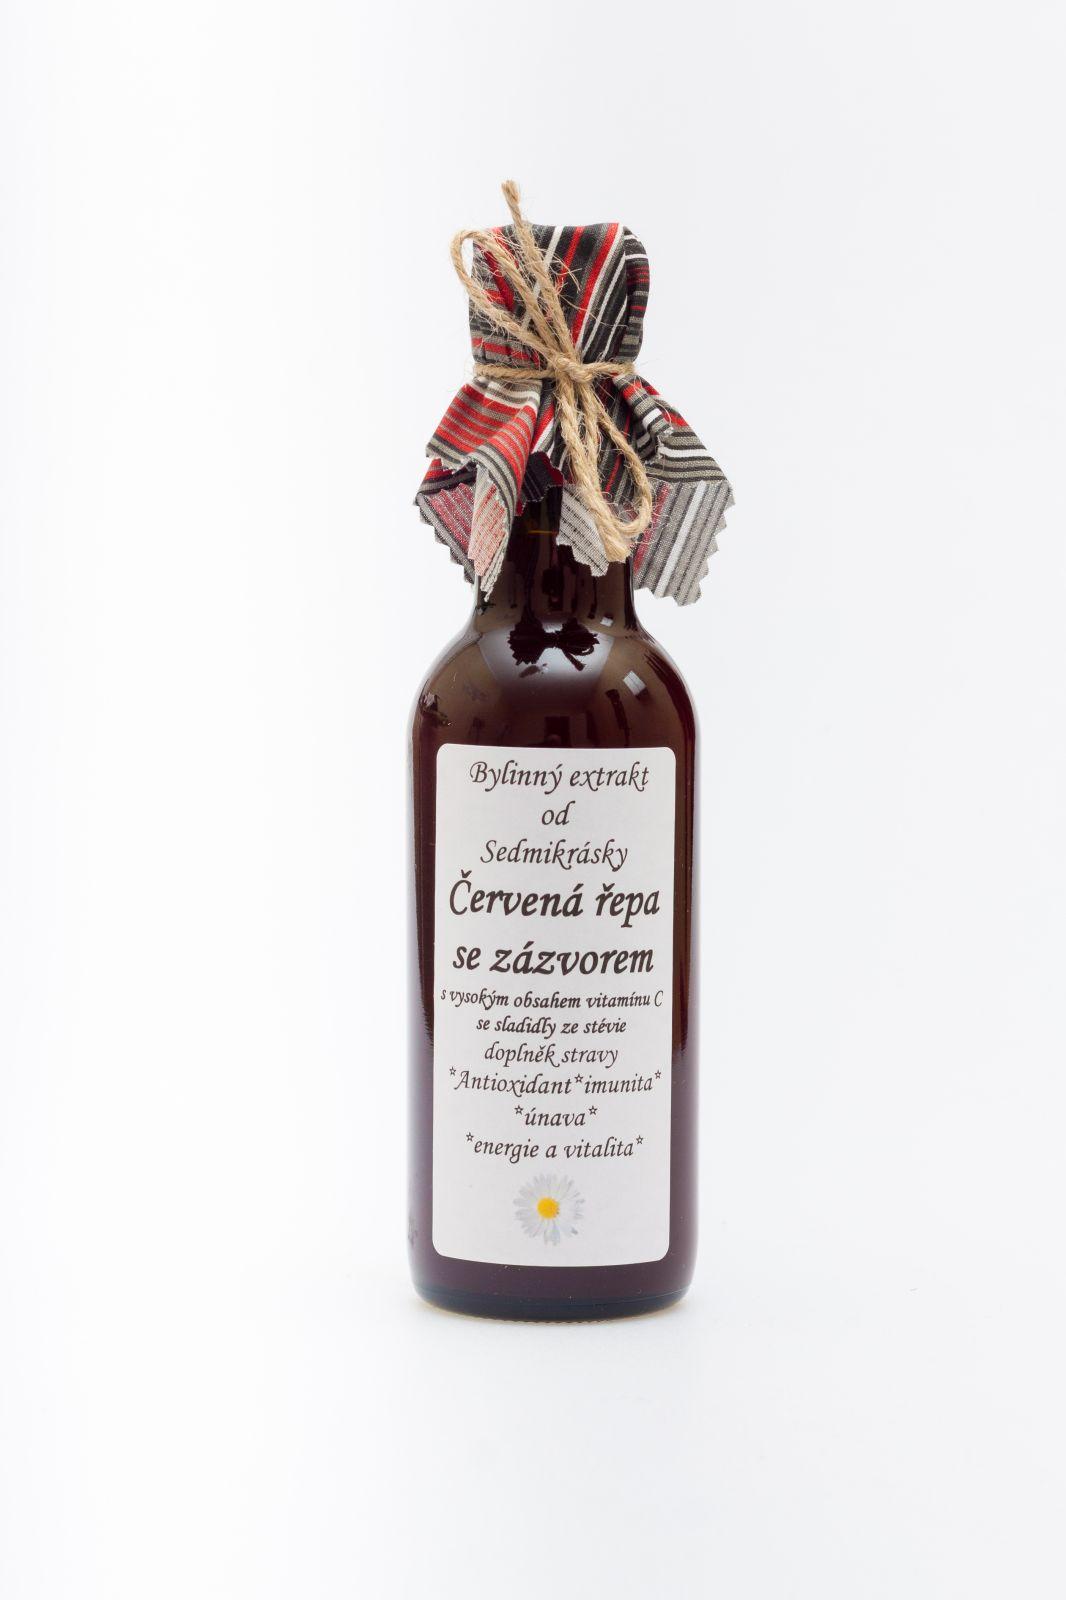 Sedmikráska ekstrakt ziołowy Burak ćwikłowy z imbirem 250ml antioxidant, imunita, únava a vyčerpání, energie a vitalita, vstřebávání železa Rodinná farma Sedmikráska